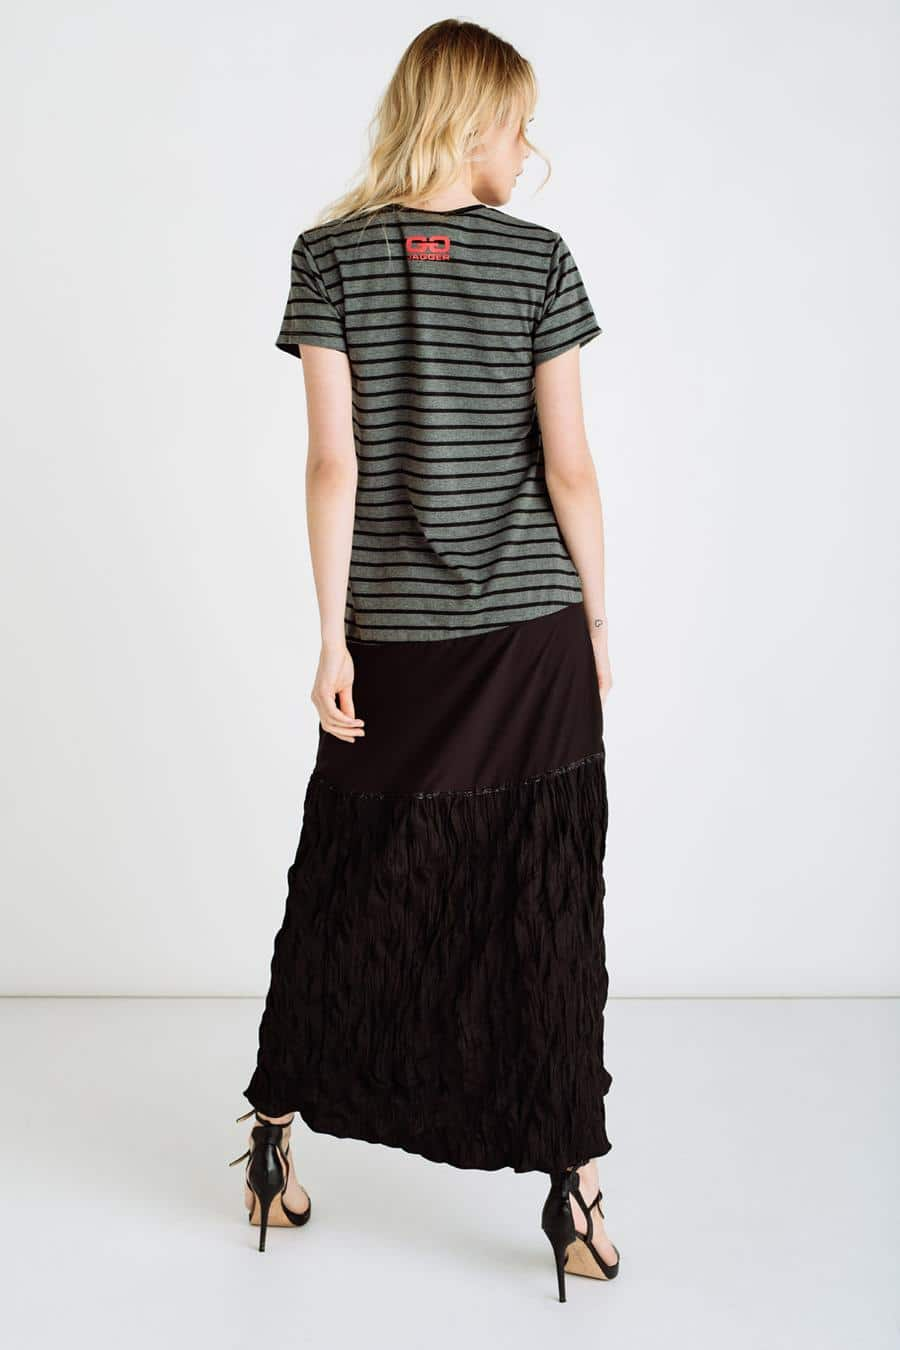 jagger zenska haljina kolekcija prolece leto ss2021 kupi online jg 5497 01 2